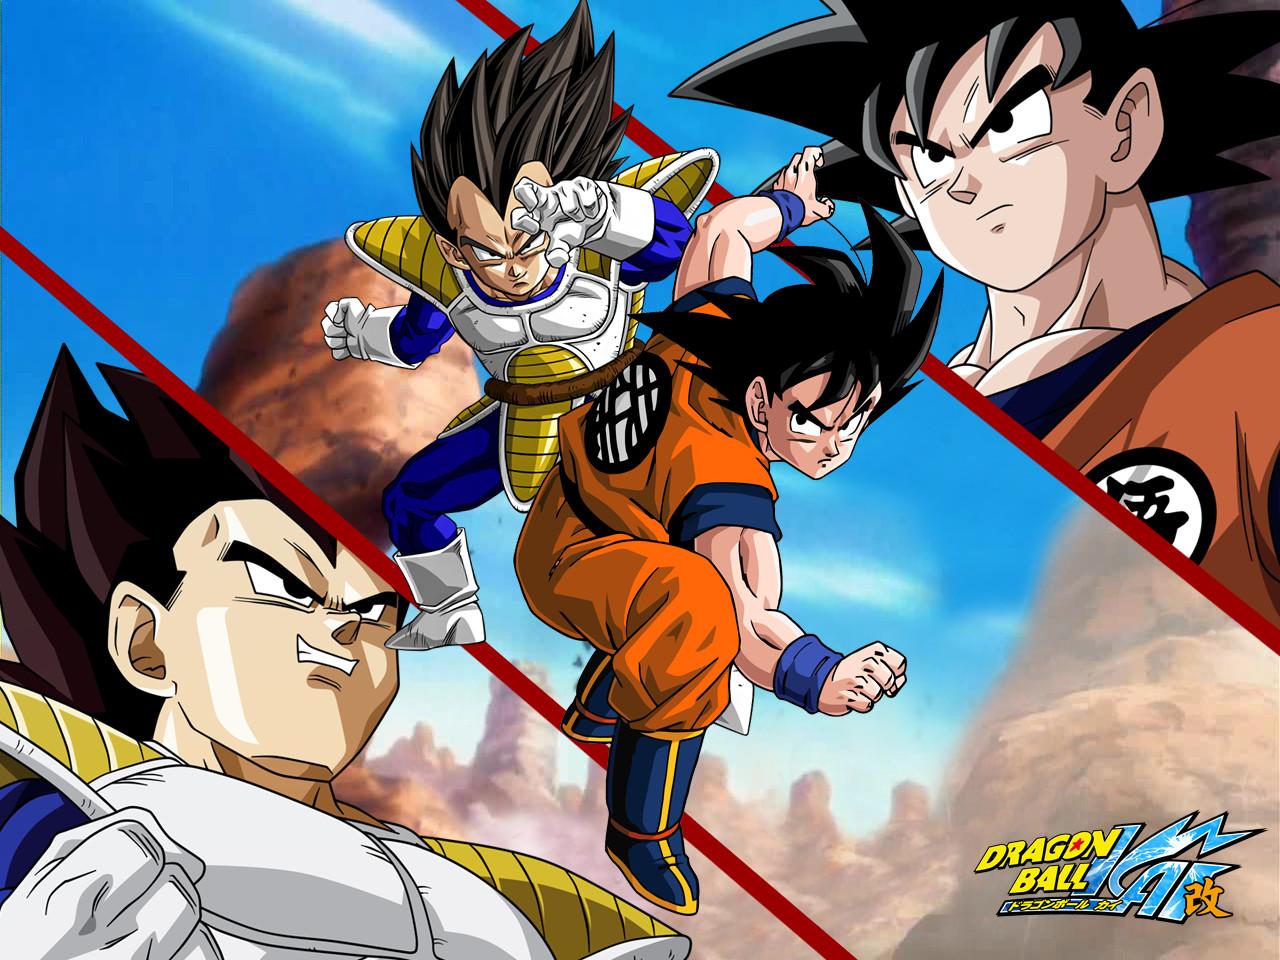 Goku vs Vegeta Wallpaper on WallpaperSafari